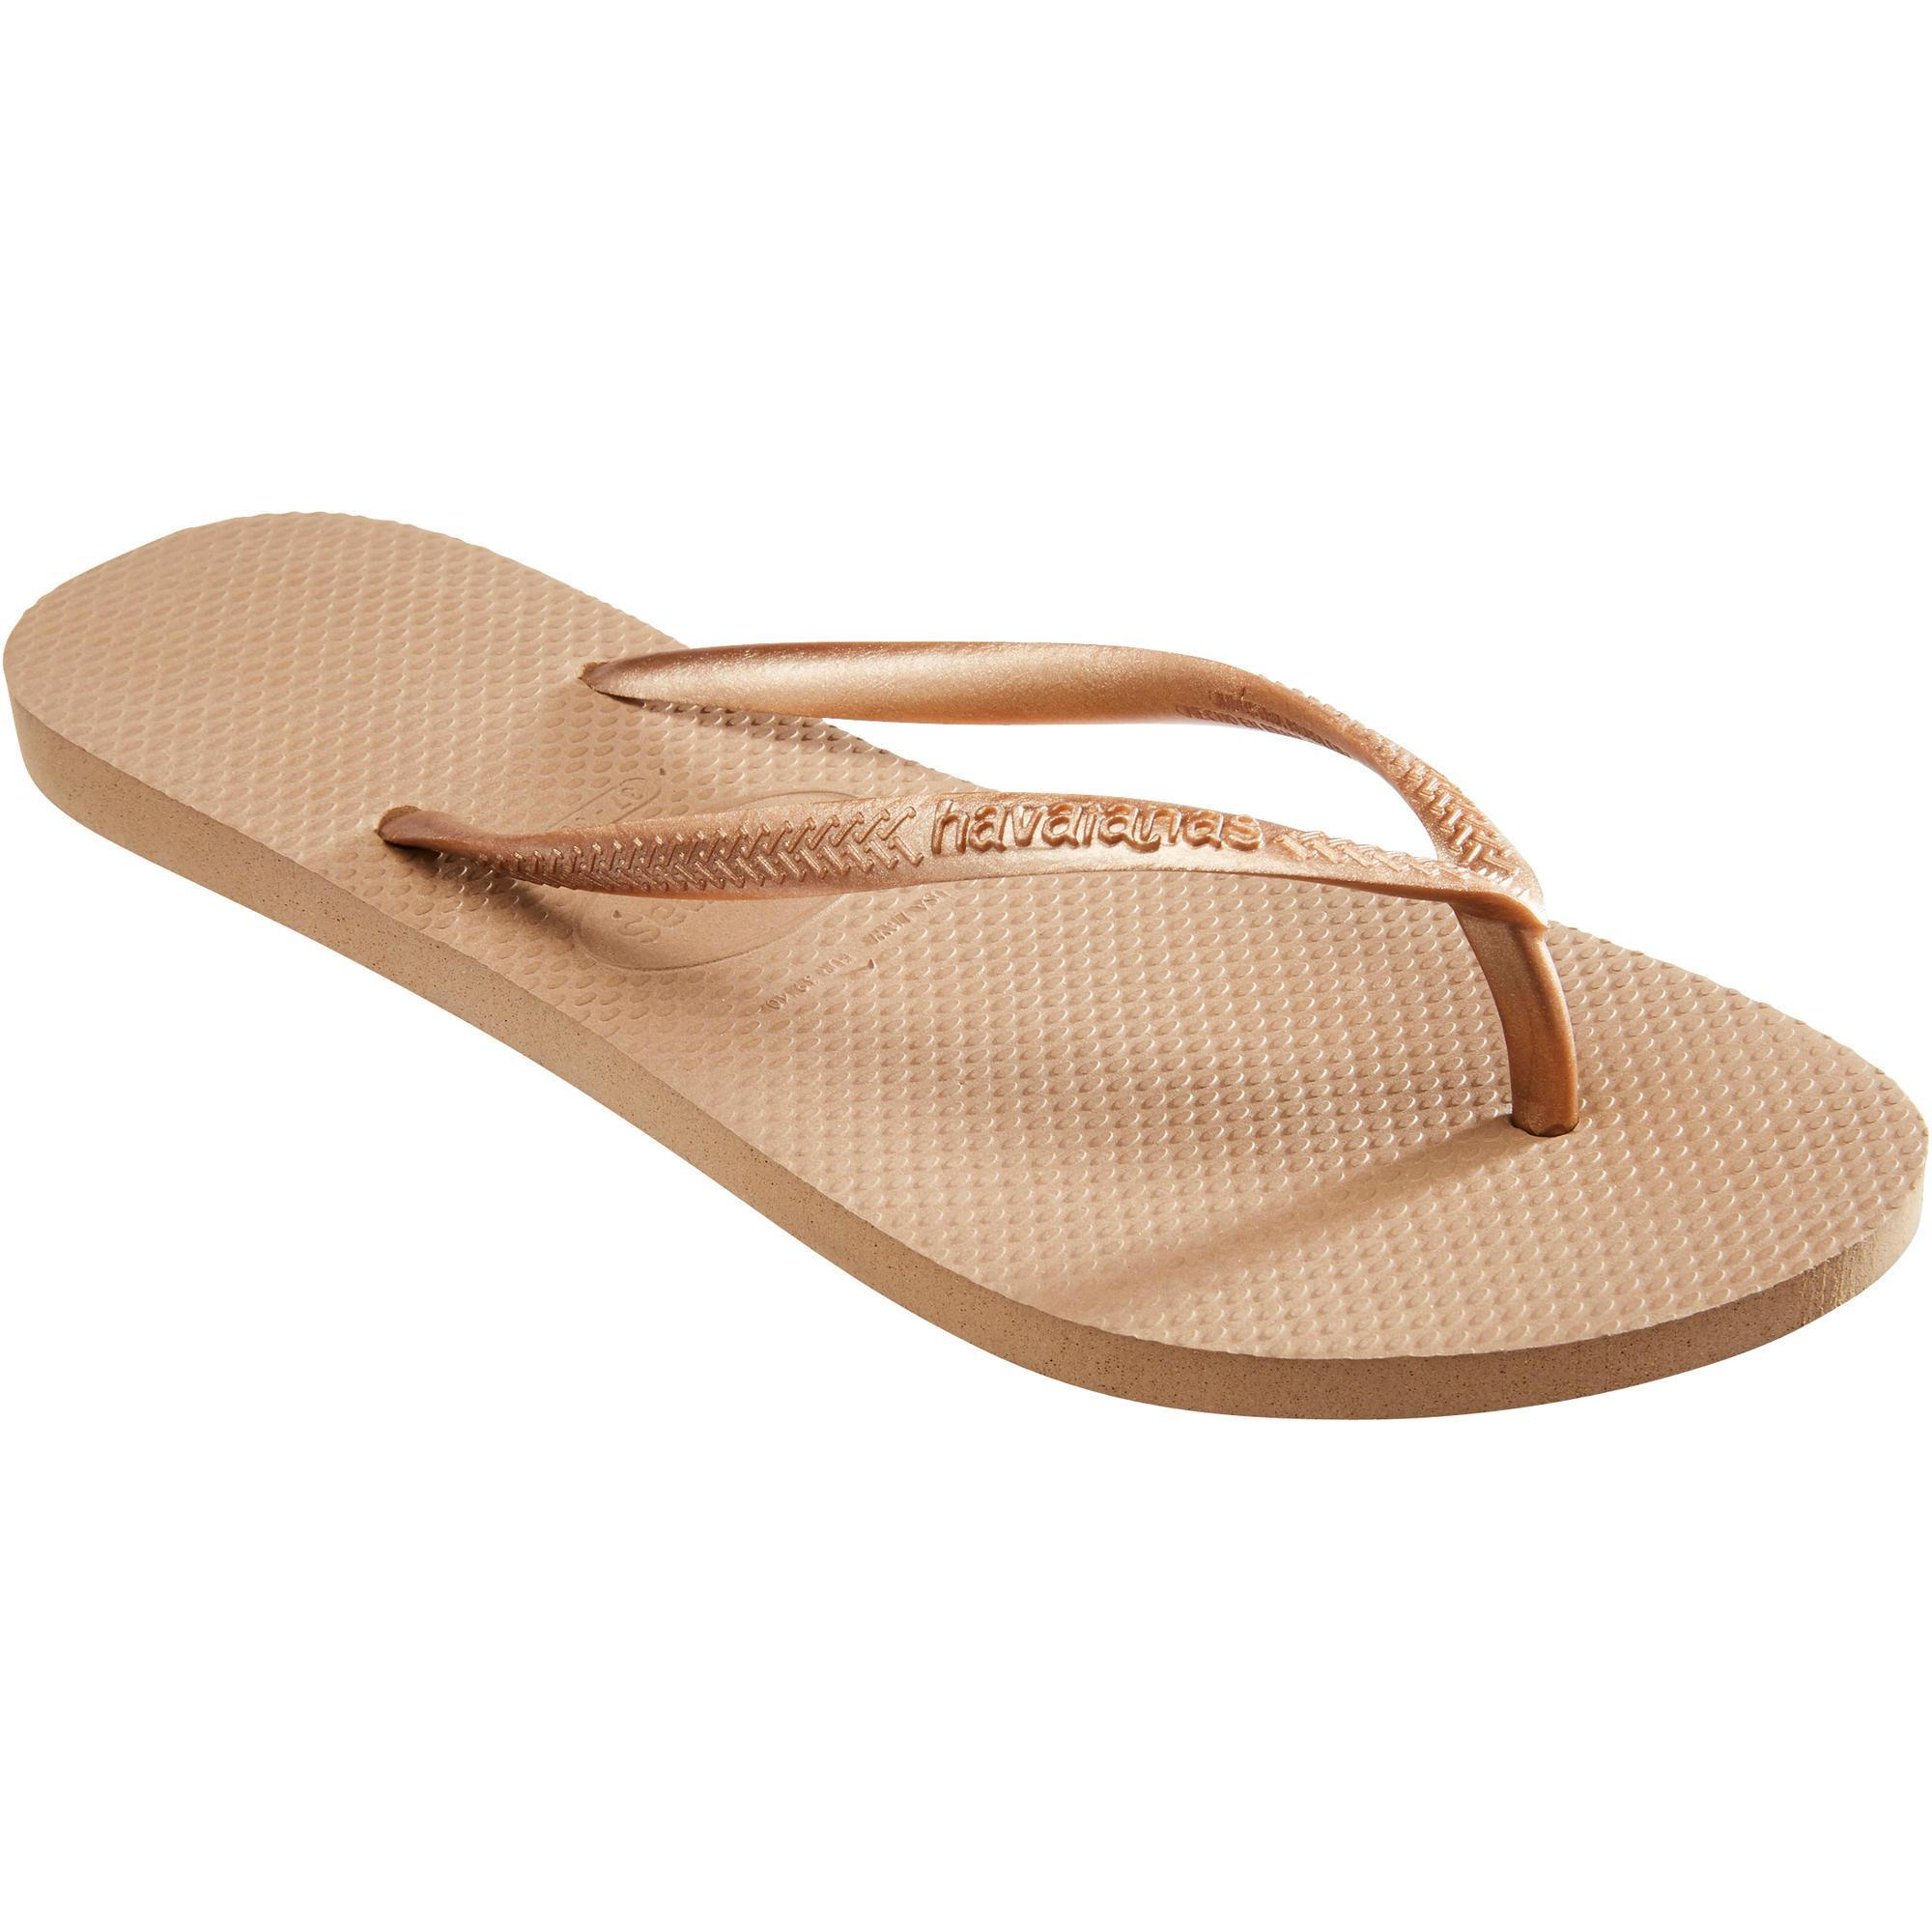 2418932 Havaianas Damesslippers Slim roze goud